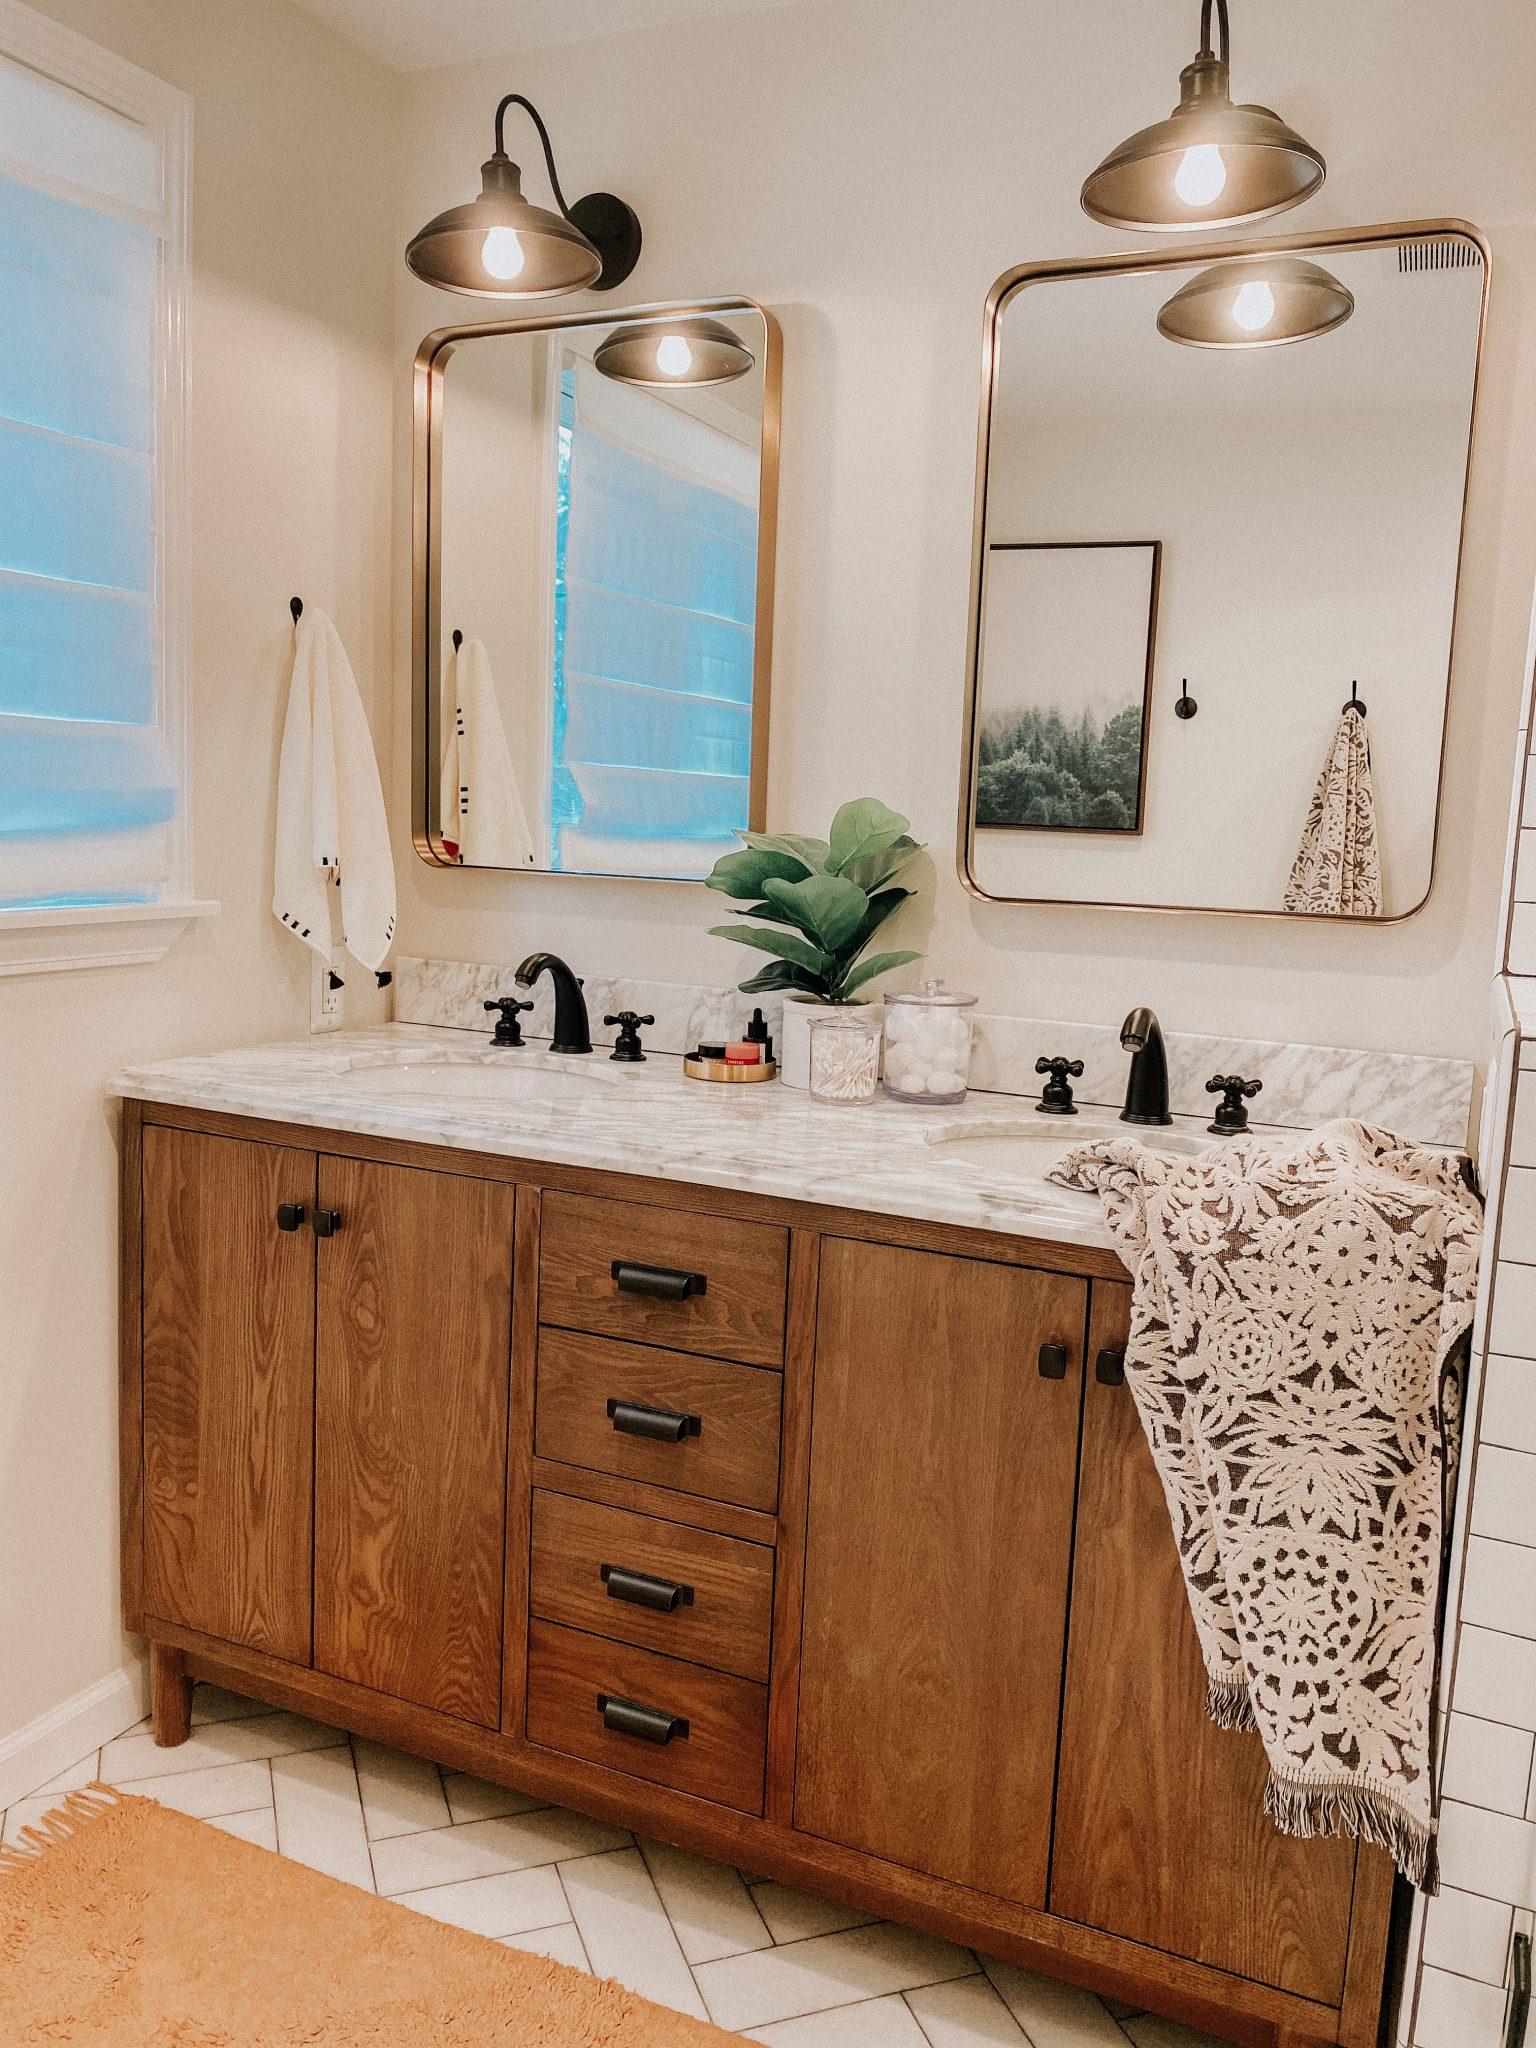 April favorites | Daily Splendor Life and Style Blog | Bathroom Vanity #goldmirrors #woodvanity #bohotowels